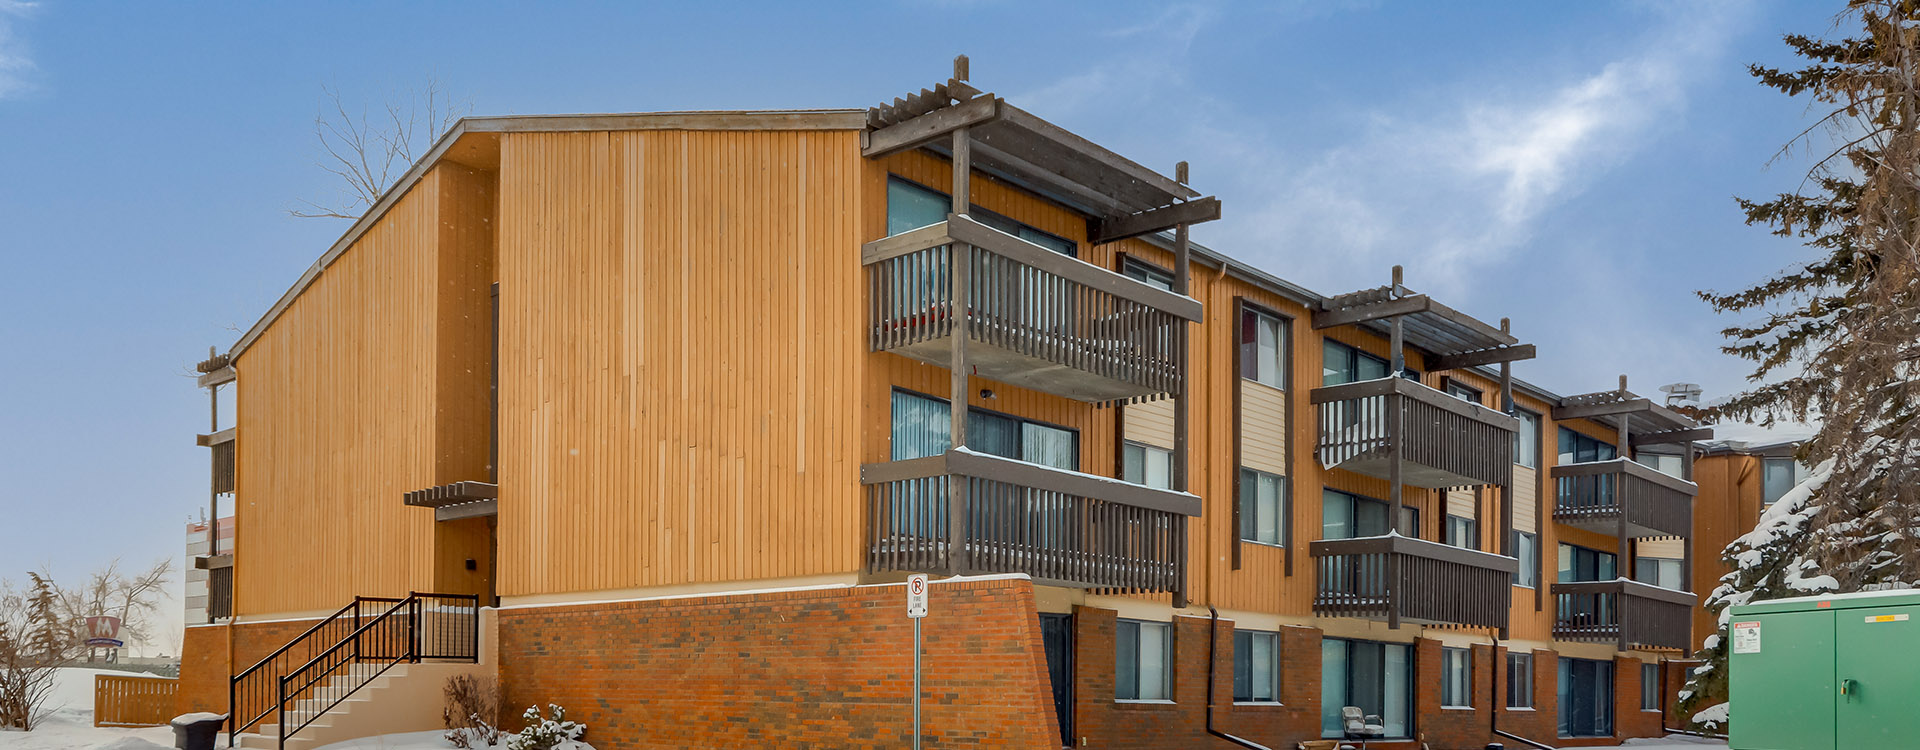 applewood-village-3805-marlborough-drive-ne-calgary-exterior